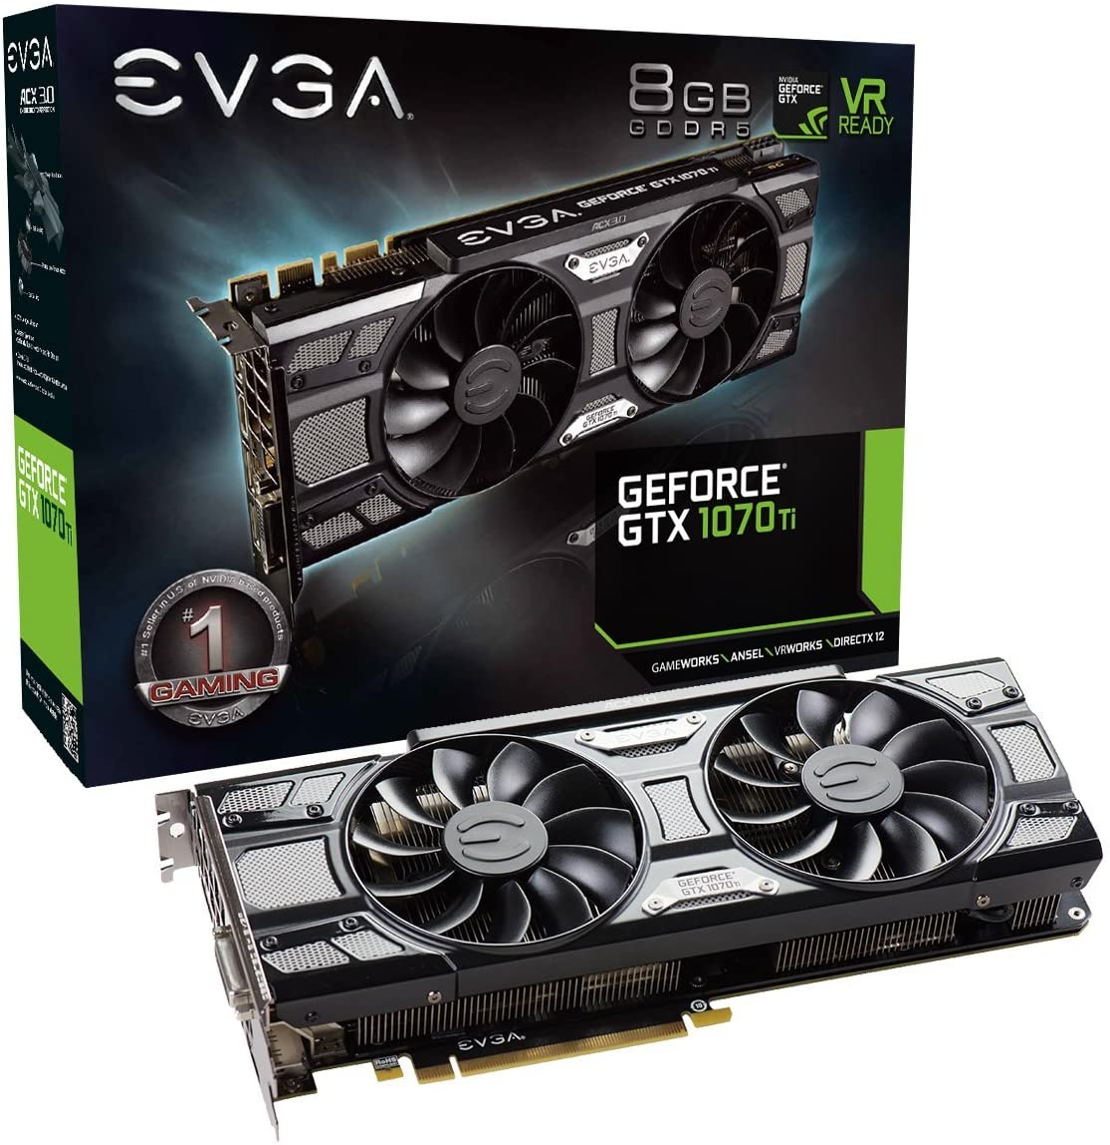 EVGA GeForce GTX 1070 Ti SC GAMING ACX 3.0 Black Edition, 8GB GDDR5, EVGA OCX Scanner OC, White LED, DX12OSD Support (PXOC) Graphics Card 08G-P4-5671-KR (Renewed)